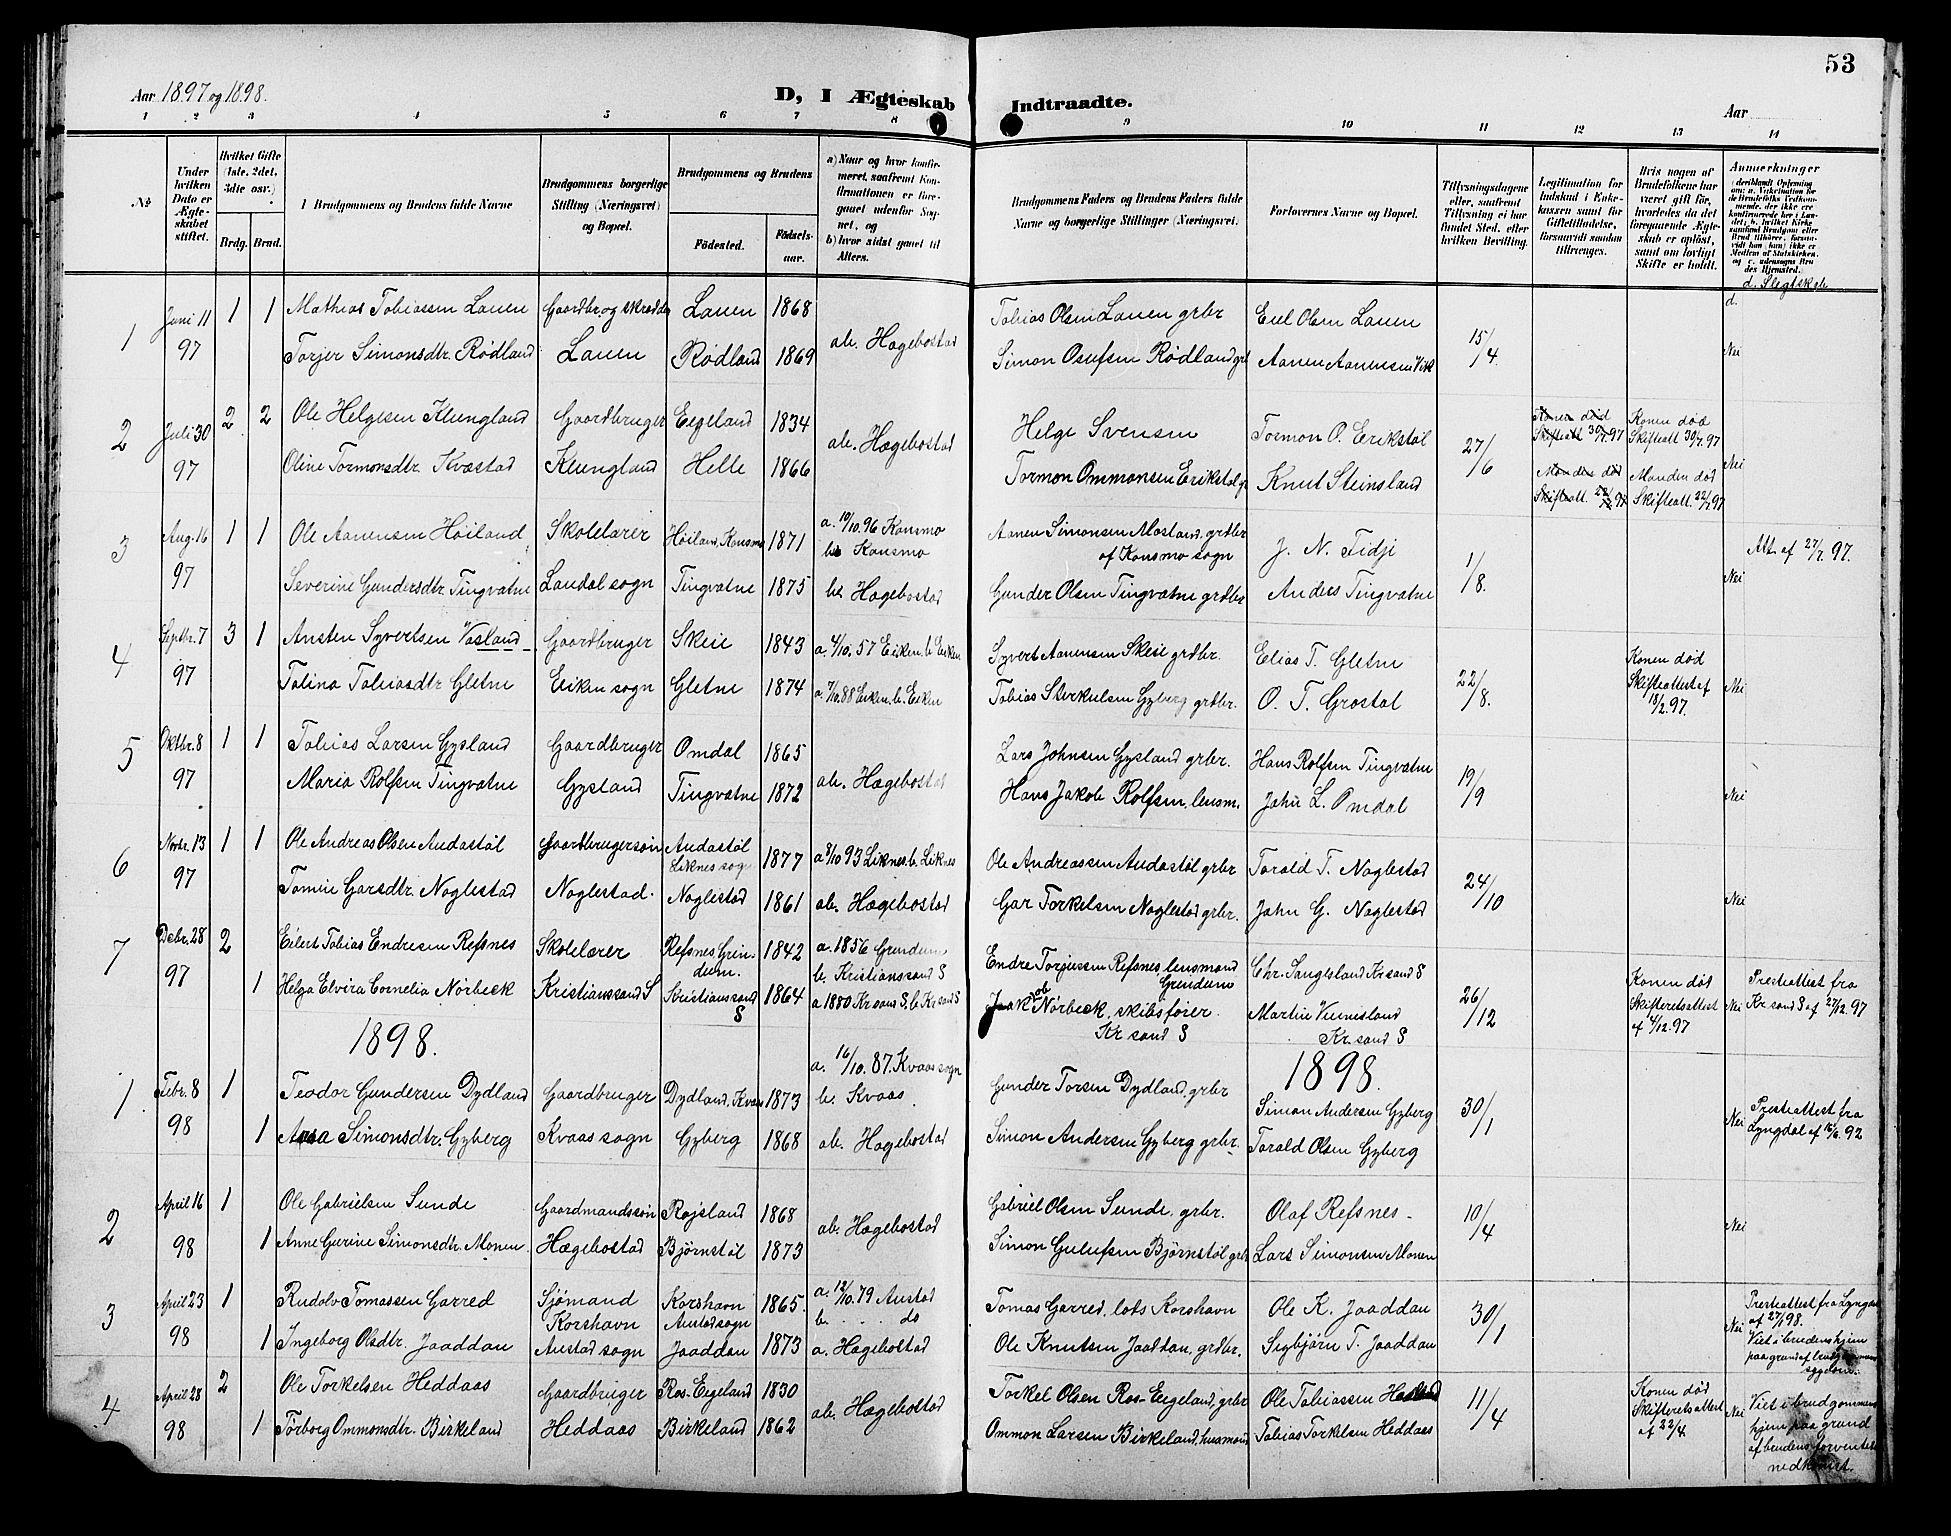 SAK, Hægebostad sokneprestkontor, F/Fb/Fba/L0004: Klokkerbok nr. B 4, 1897-1907, s. 53